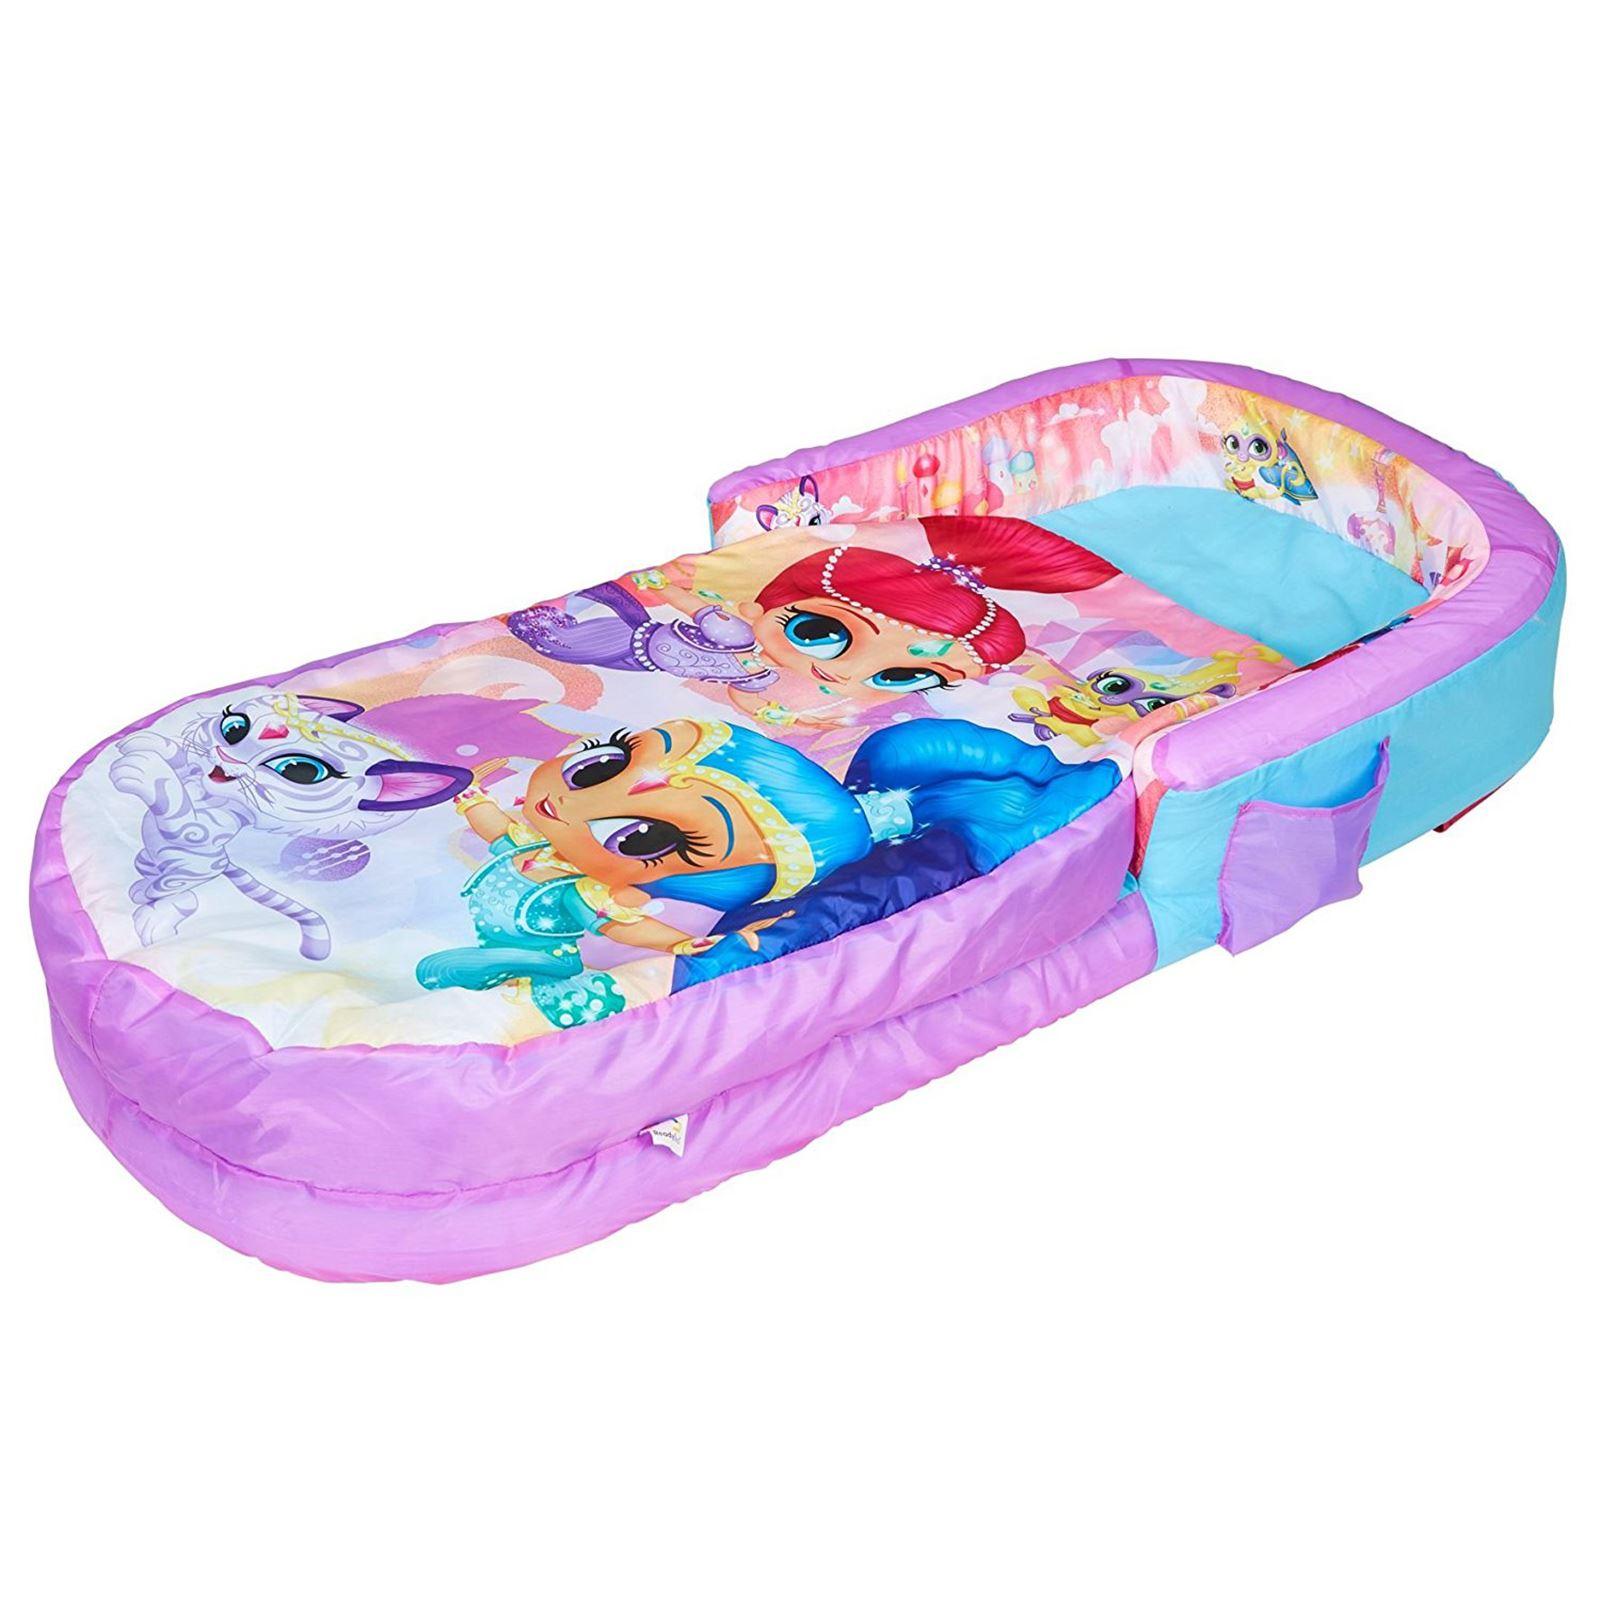 Disney Ready Bed Inflatable Sleeping Bag